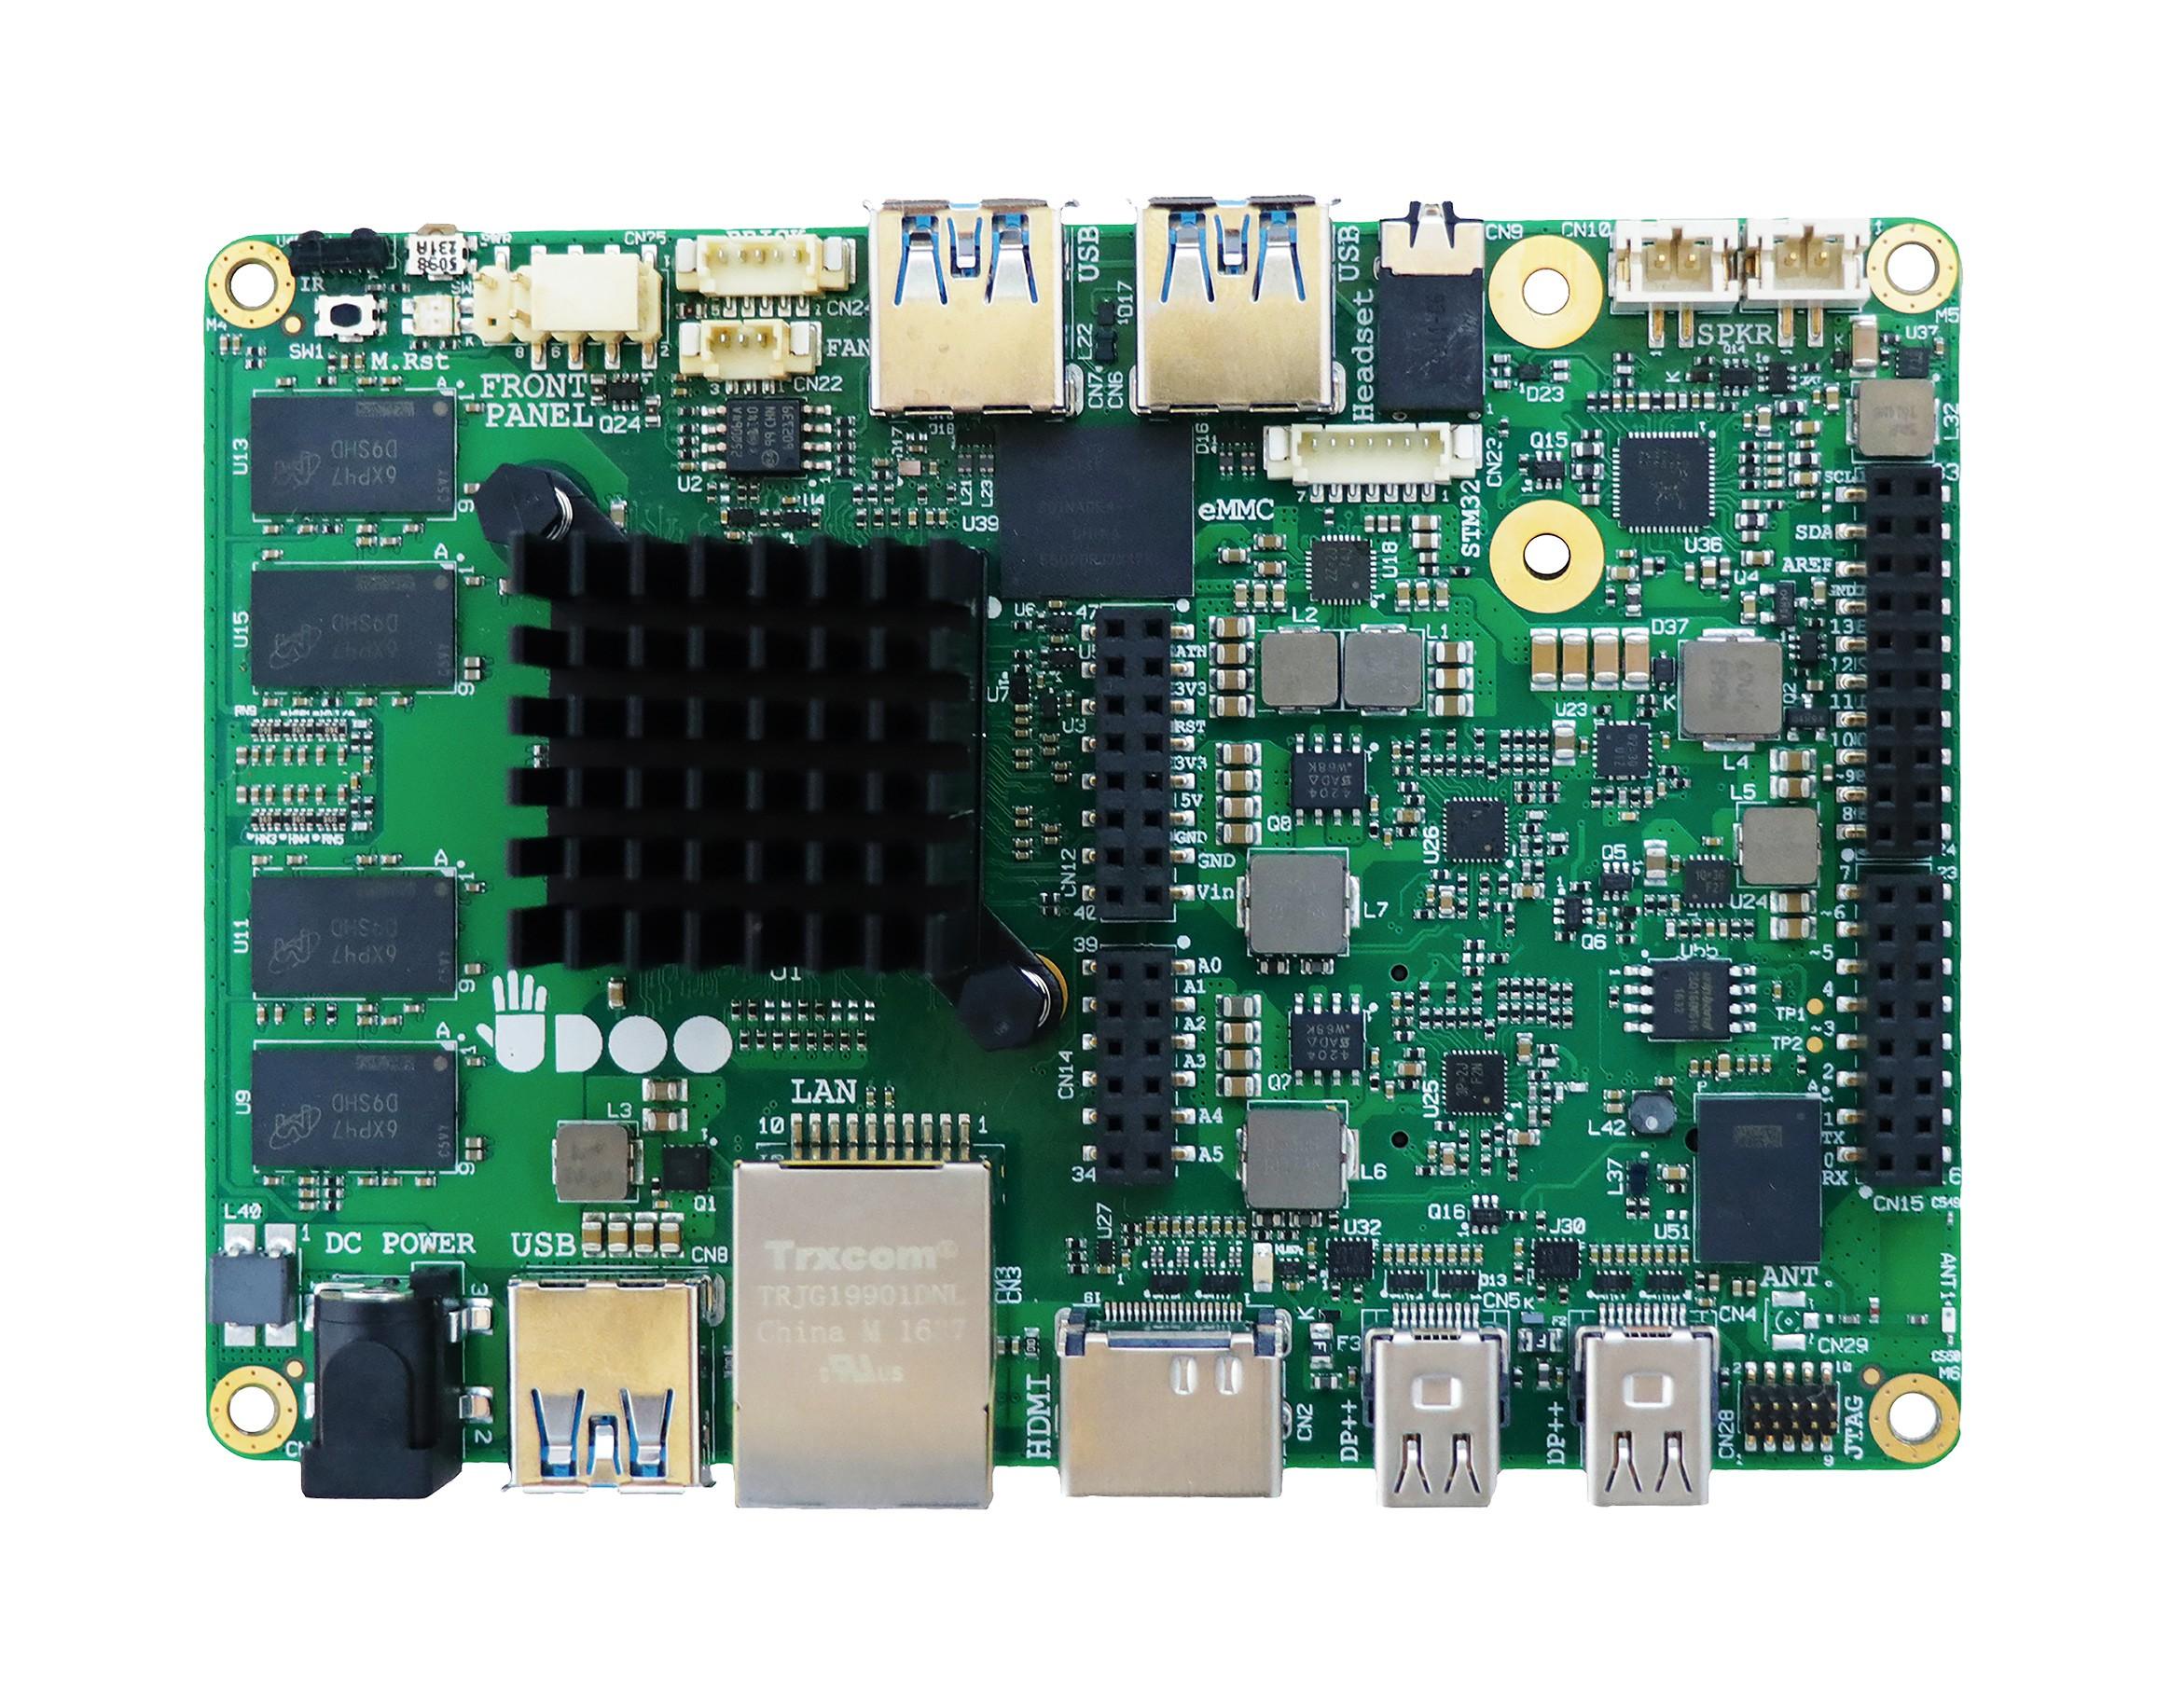 Top 10 Single Board Computers (SBCs) of 2017 - Electronics-Lab